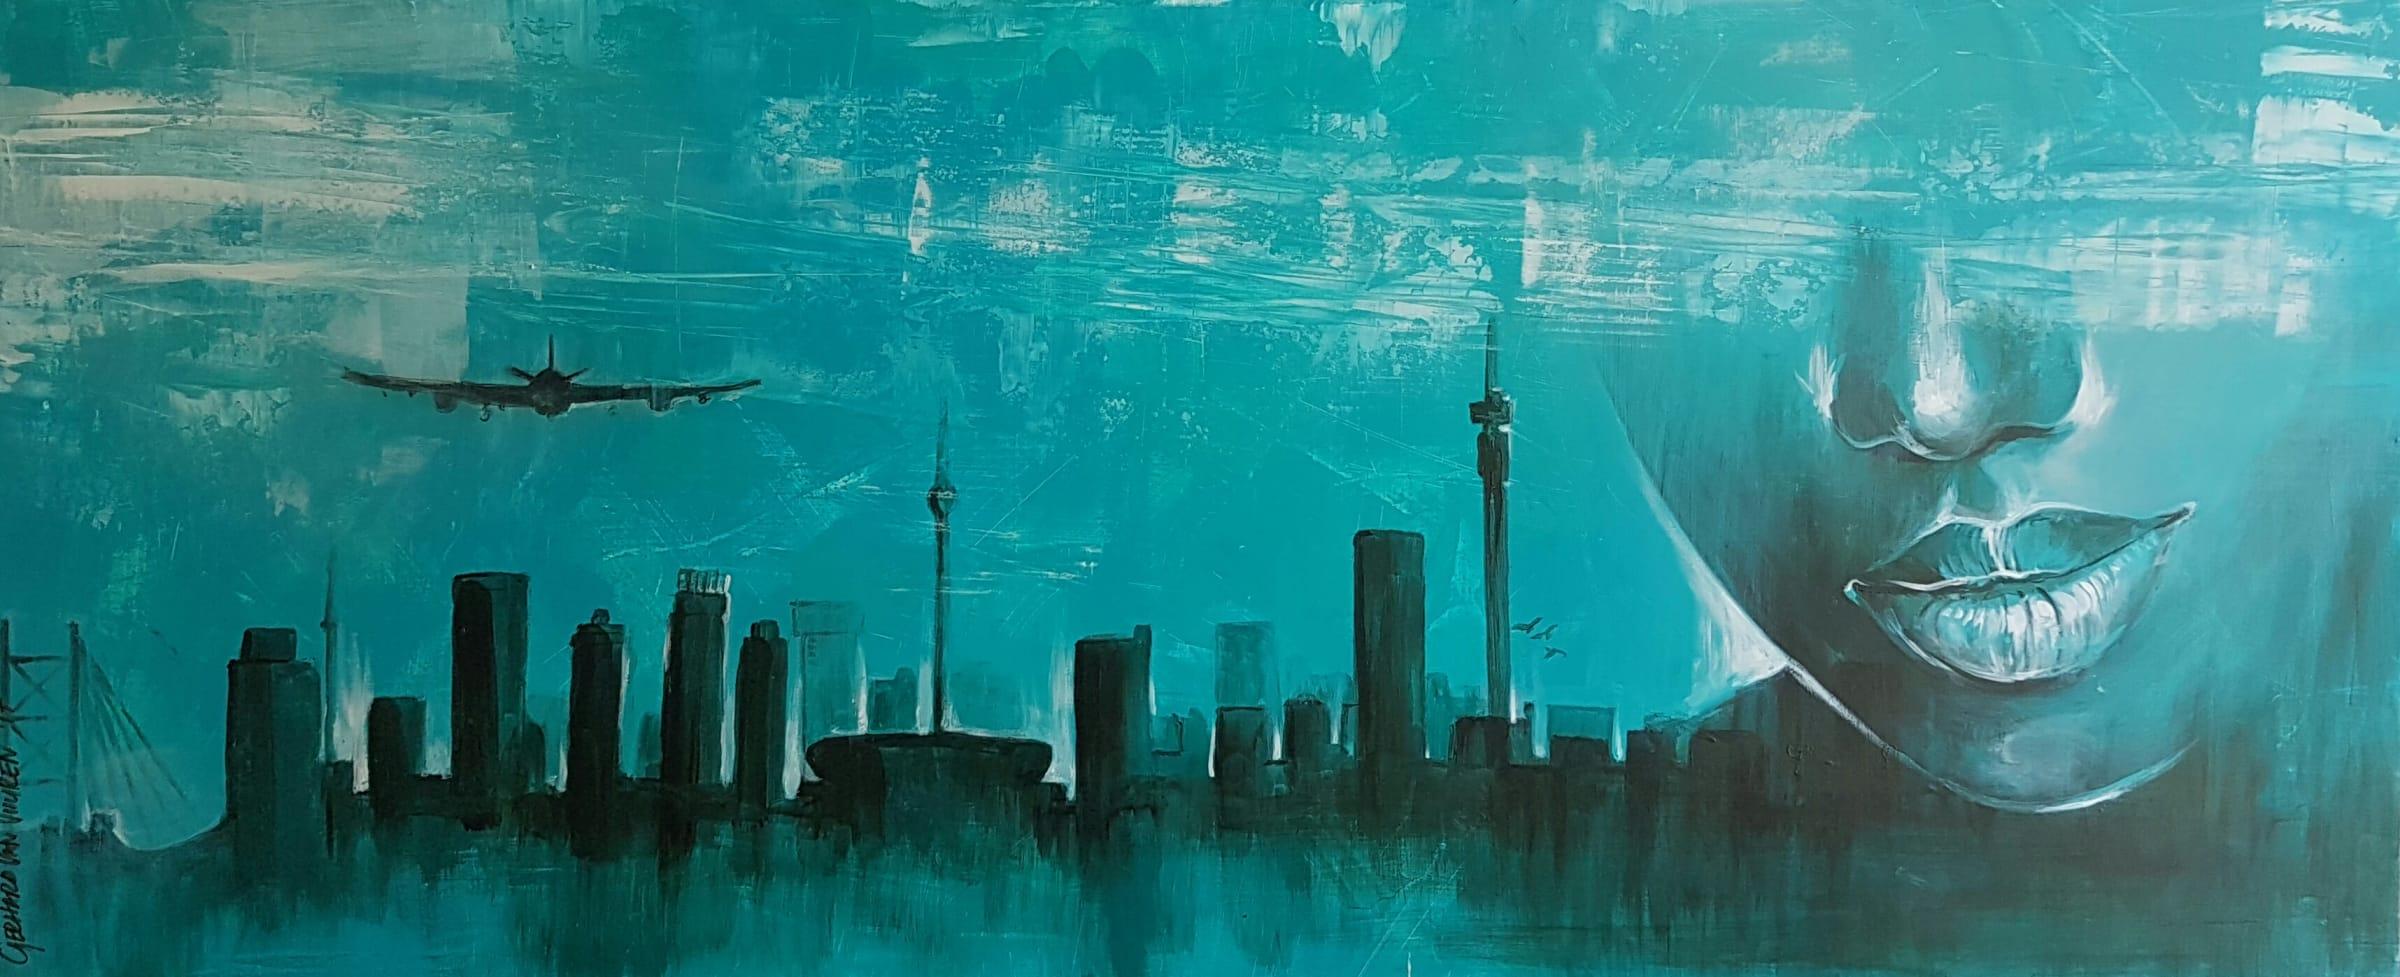 <span class=&#34;link fancybox-details-link&#34;><a href=&#34;/artworks/categories/121/3019-gerhard-van-vuuren-jozi-s-whisper-2016/&#34;>View Detail Page</a></span><div class=&#34;artist&#34;><strong>Gerhard Van Vuuren</strong></div> <div class=&#34;title&#34;><em>Jozi's Whisper</em>, 2016</div> <div class=&#34;medium&#34;>Acrylic On Board</div> <div class=&#34;dimensions&#34;>62cm x 150cm</div><div class=&#34;price&#34;>R12,000.00</div>